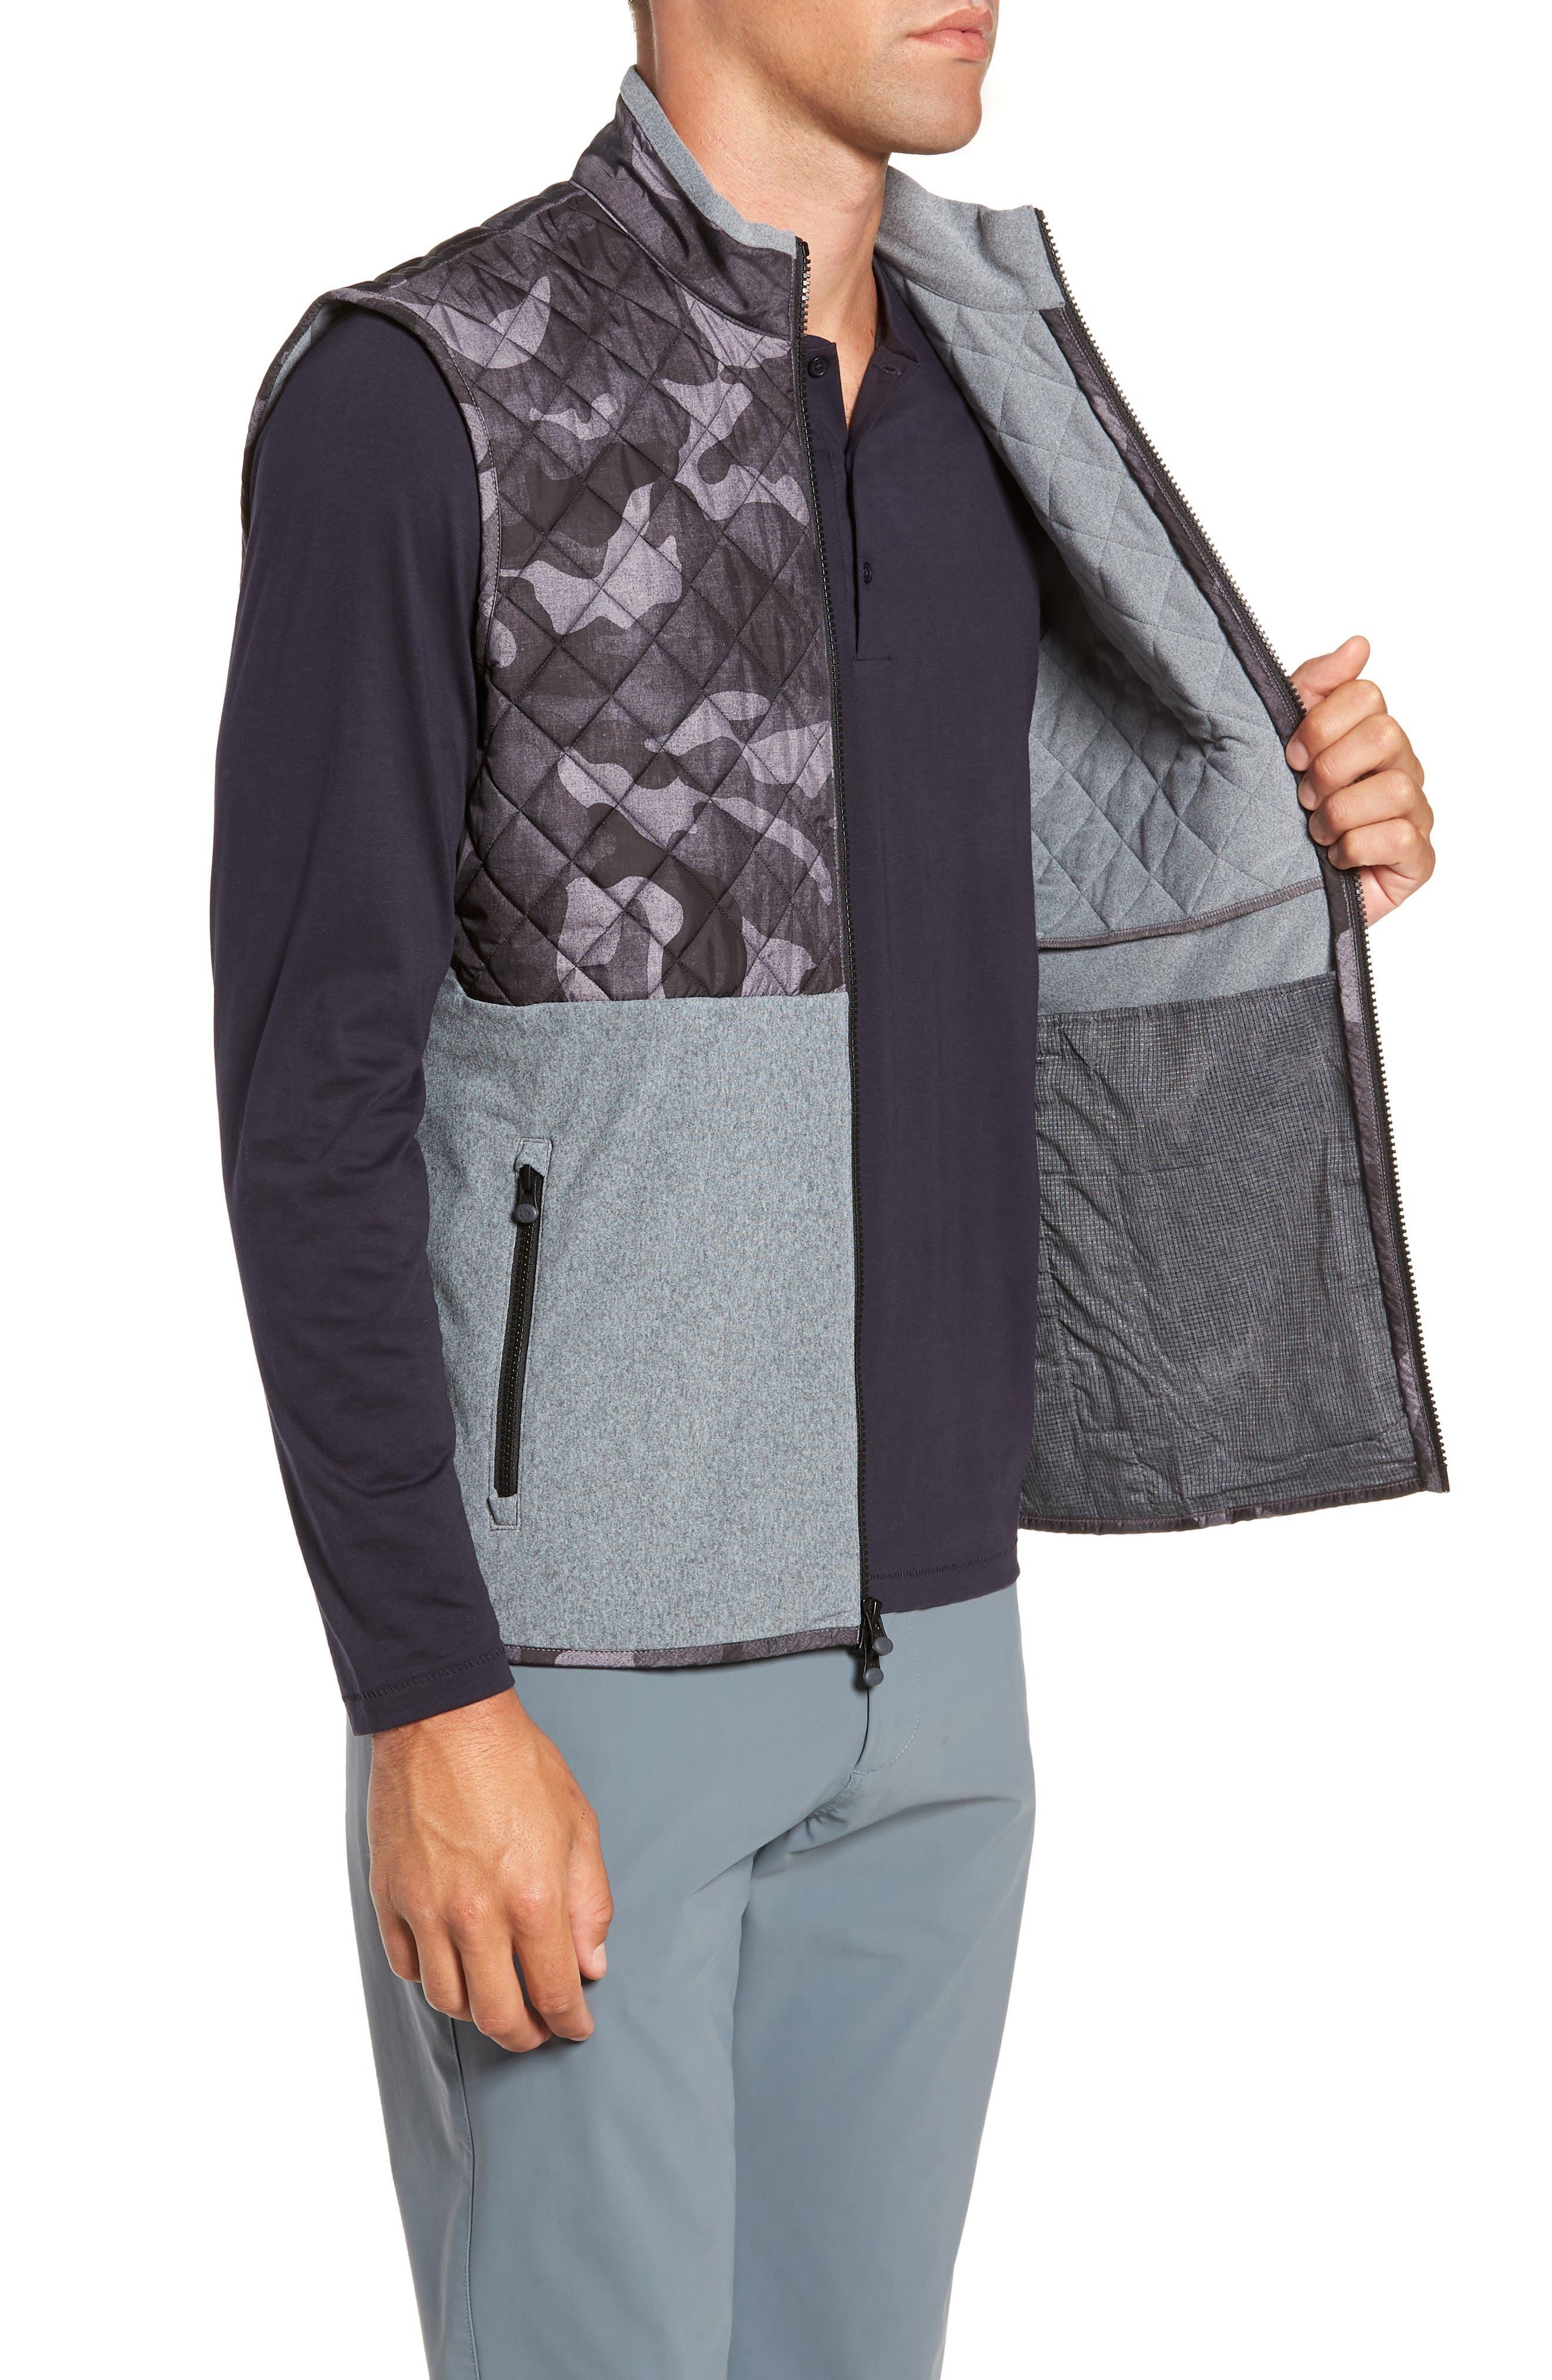 Huron Hybrid Vest,                             Alternate thumbnail 3, color,                             GREY HEATHER/ GREY CAMO